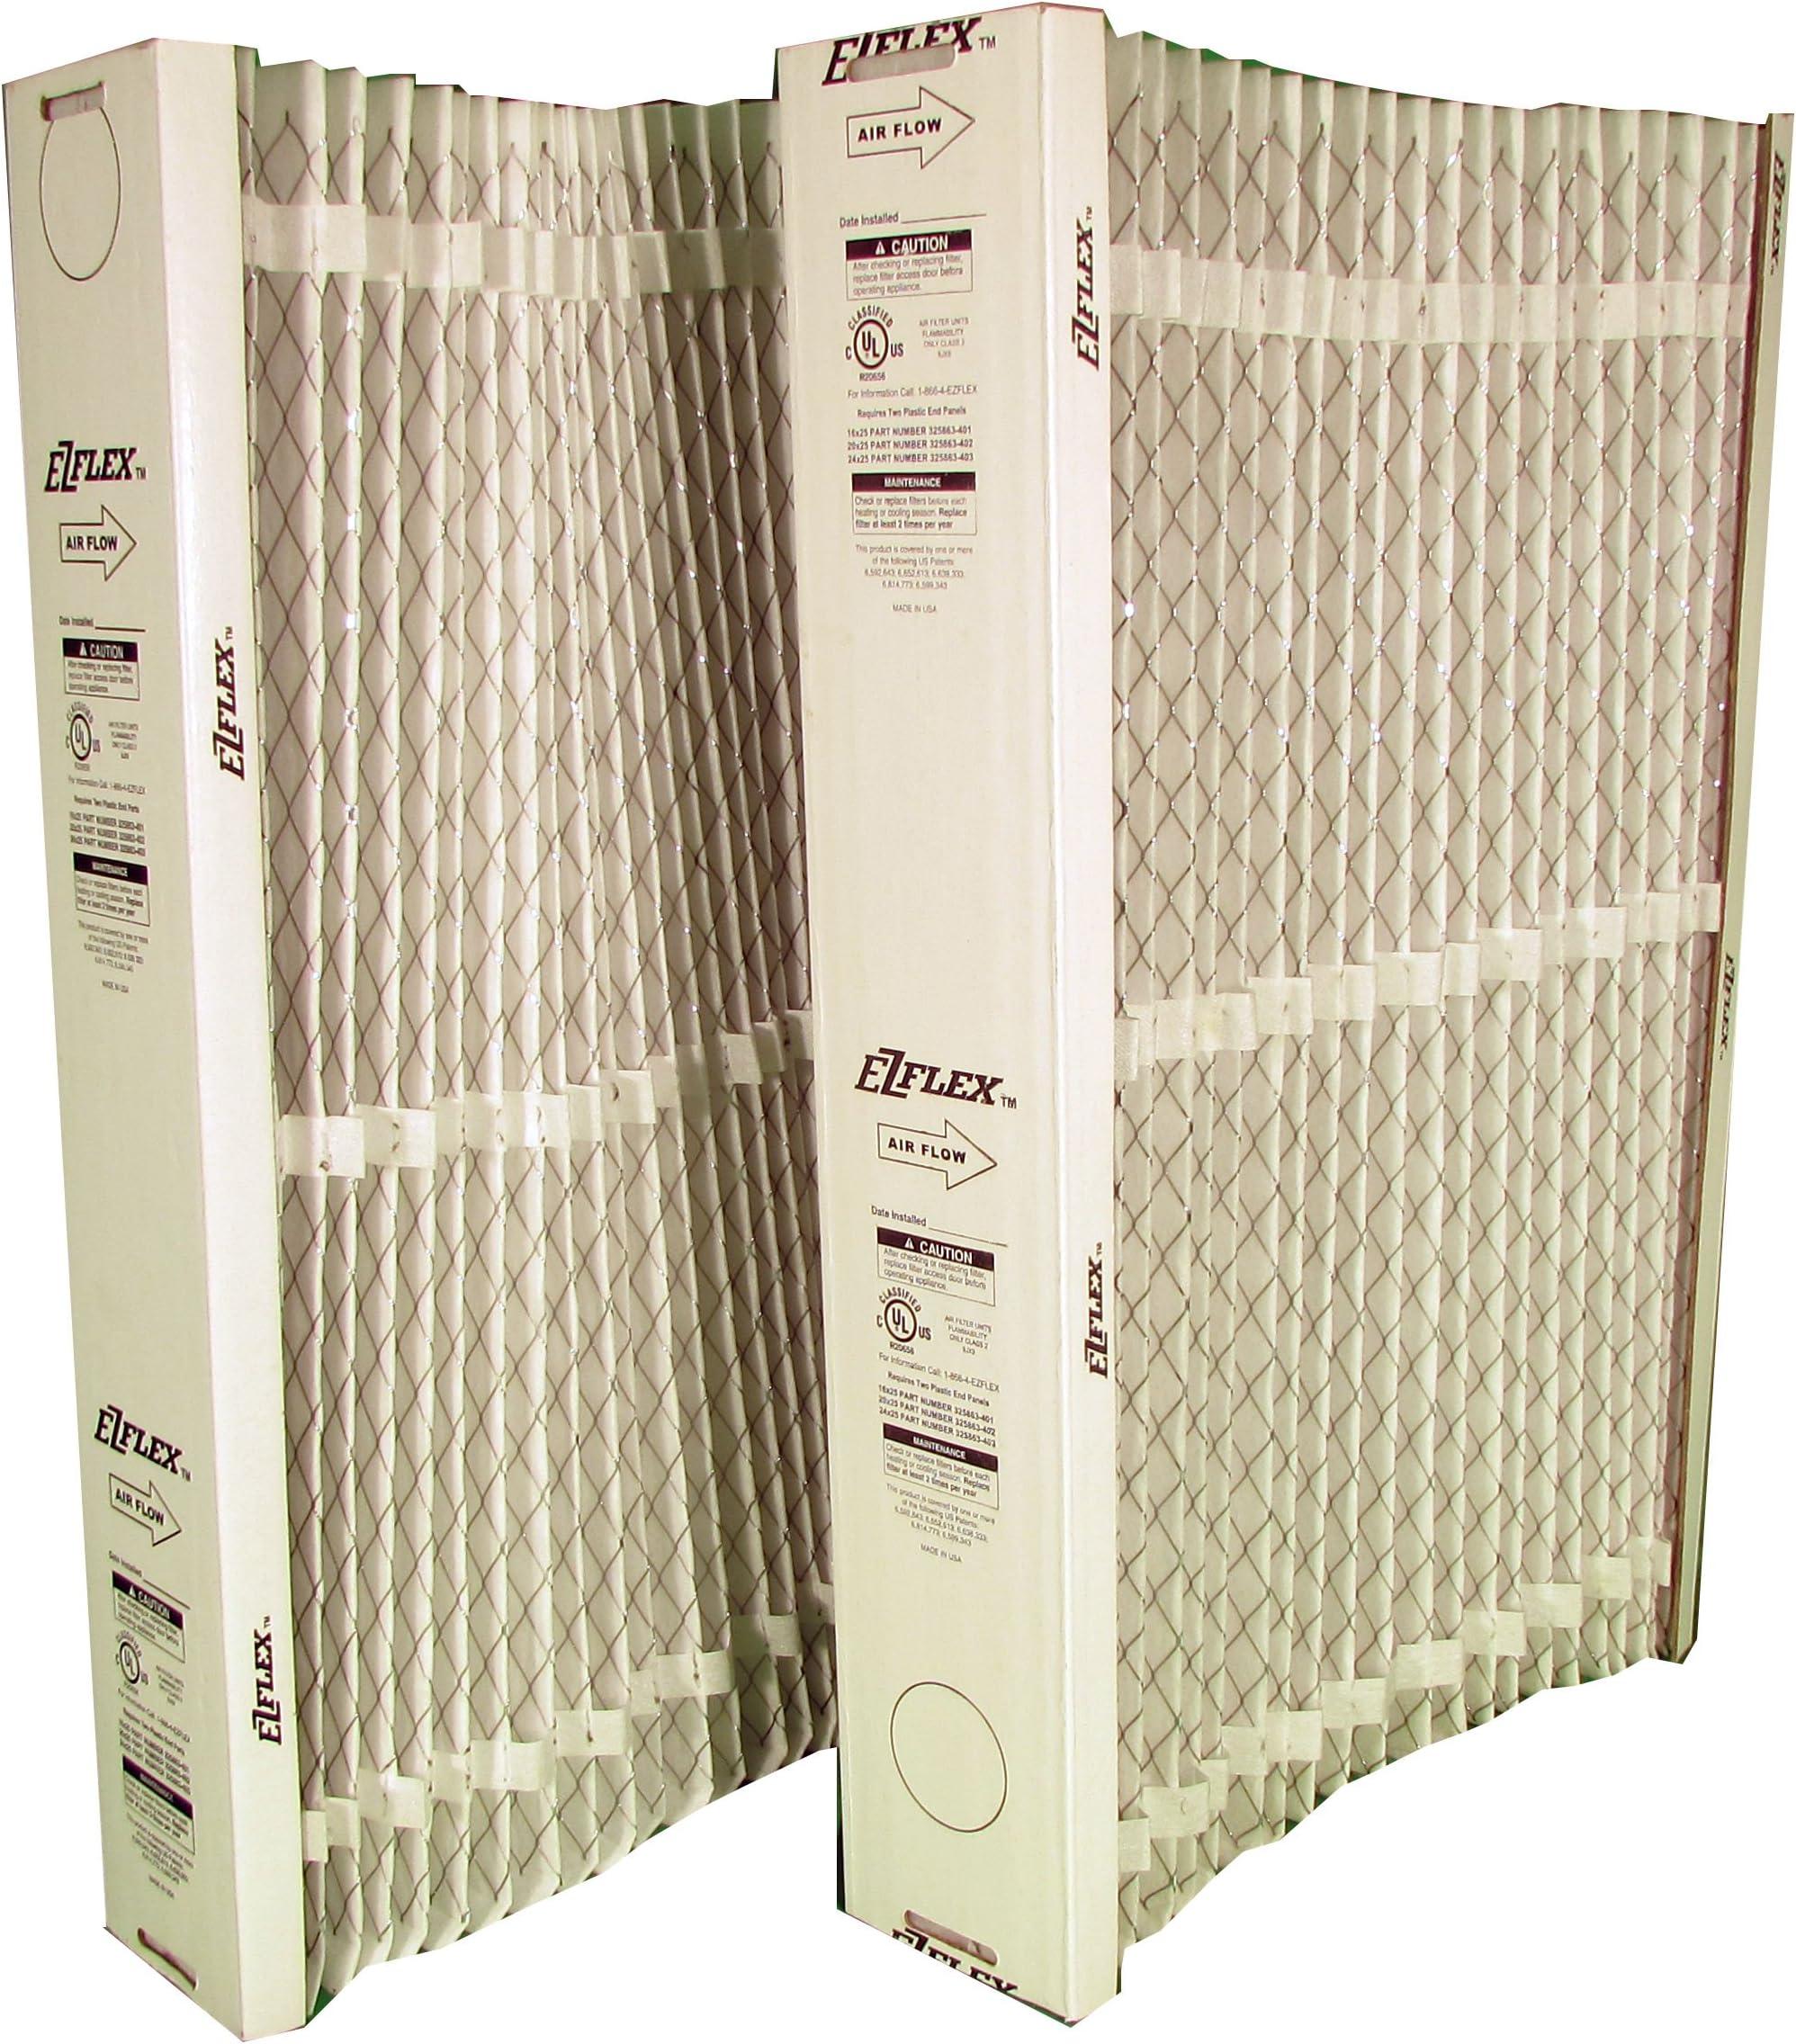 Spectrum Laboratories Membrane Filters Pack of 10 145765 Spectra Mesh Woven Membrane Filters